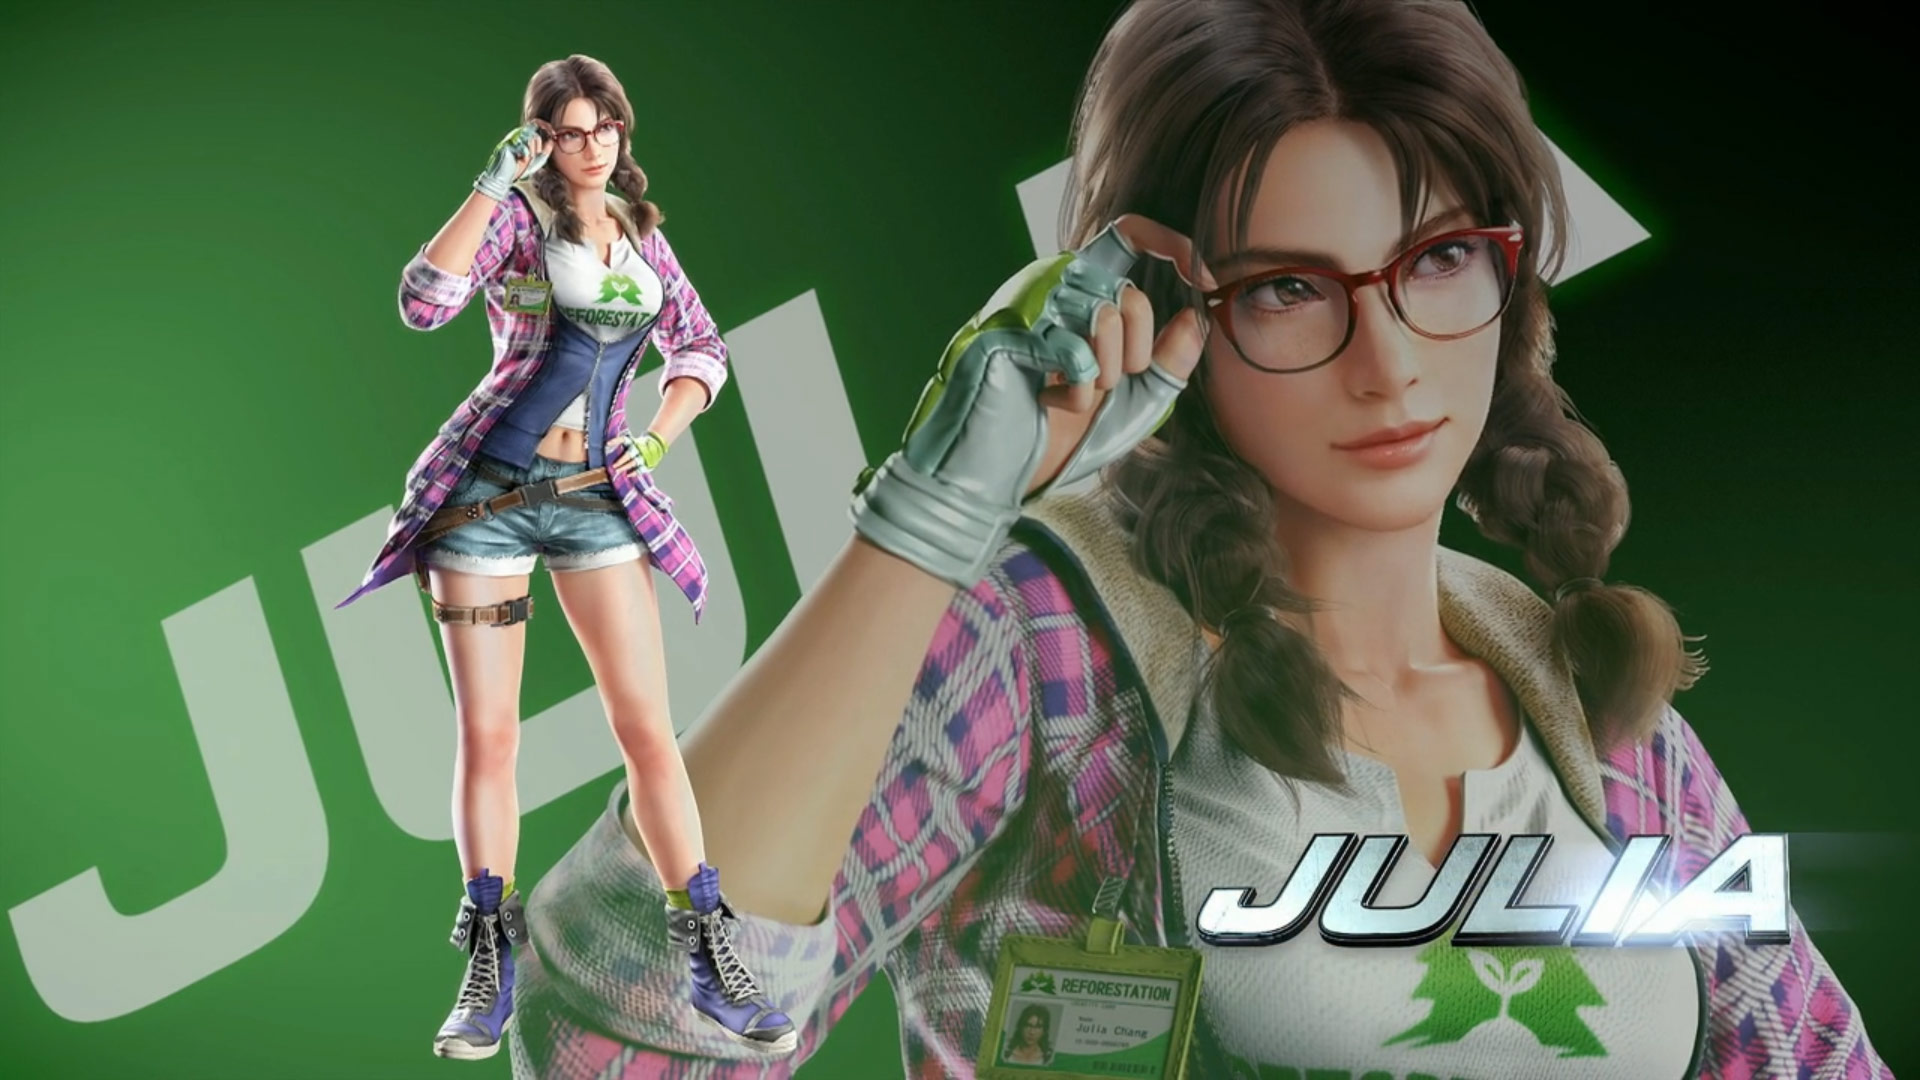 Tekken 7 Julia and Negan Reveal Screenshots 2 out of 12 image gallery